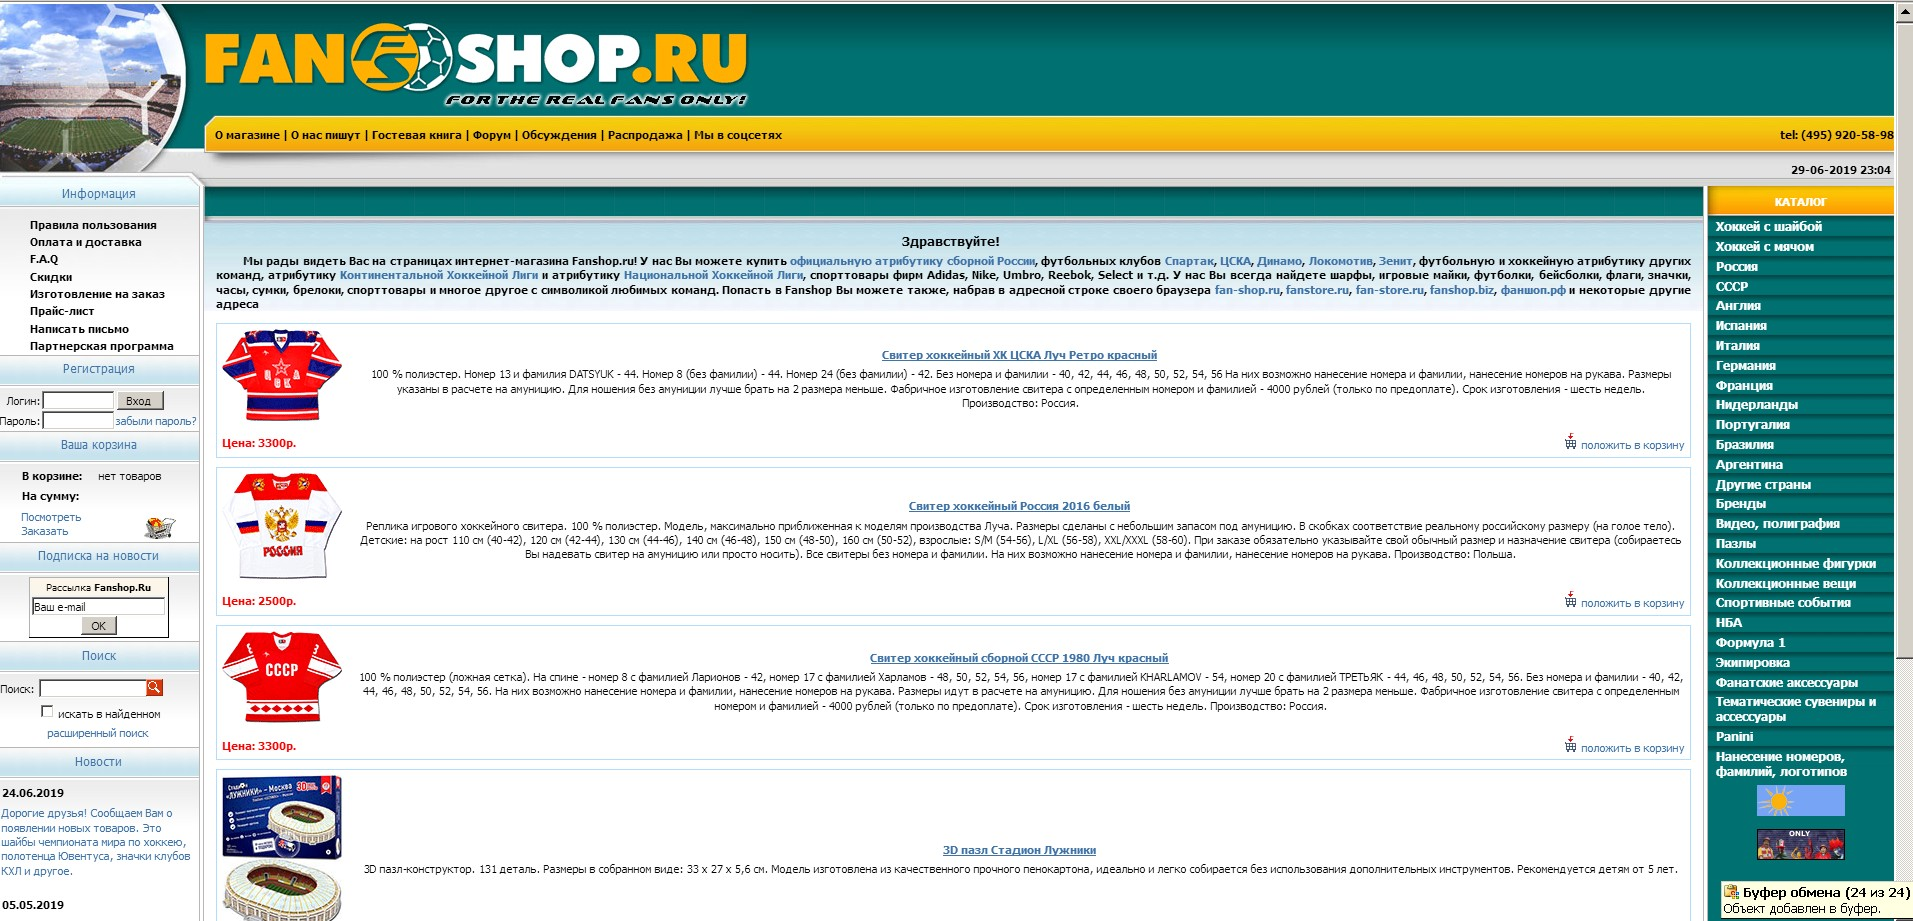 логотип fanshop.ru